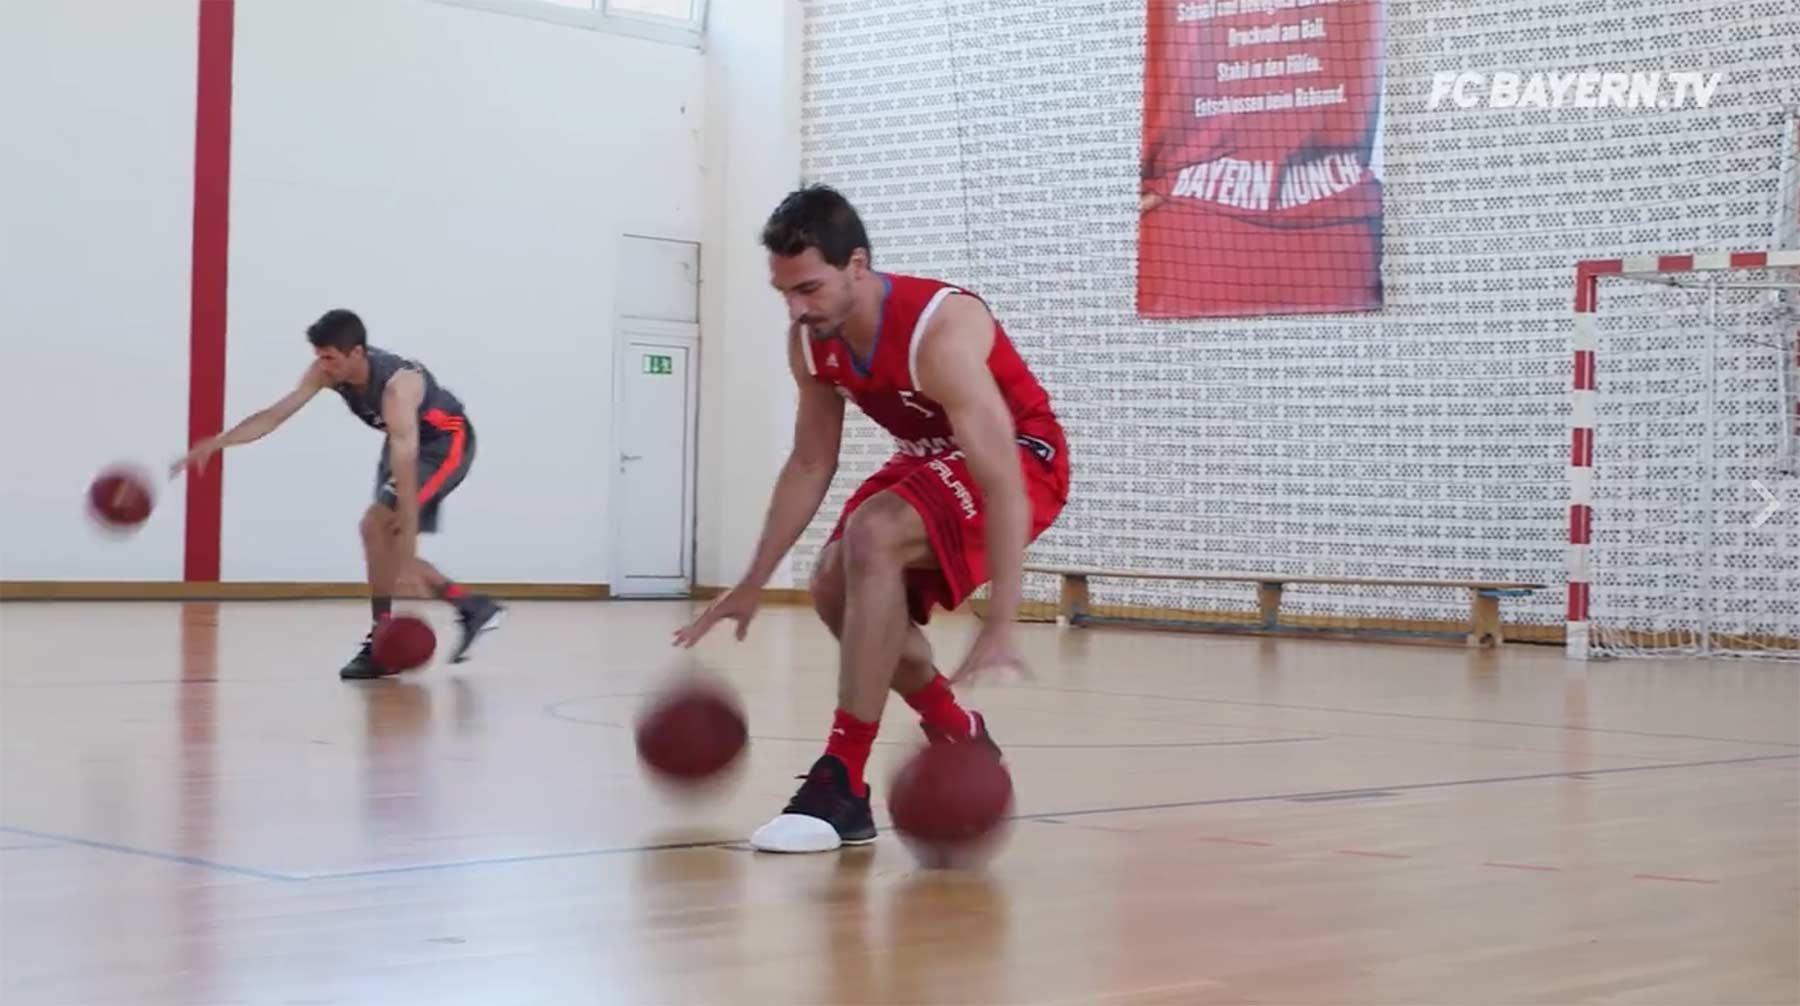 Mats Hummels und Thomas Müller battlen sich in diversen Sport-Challenges